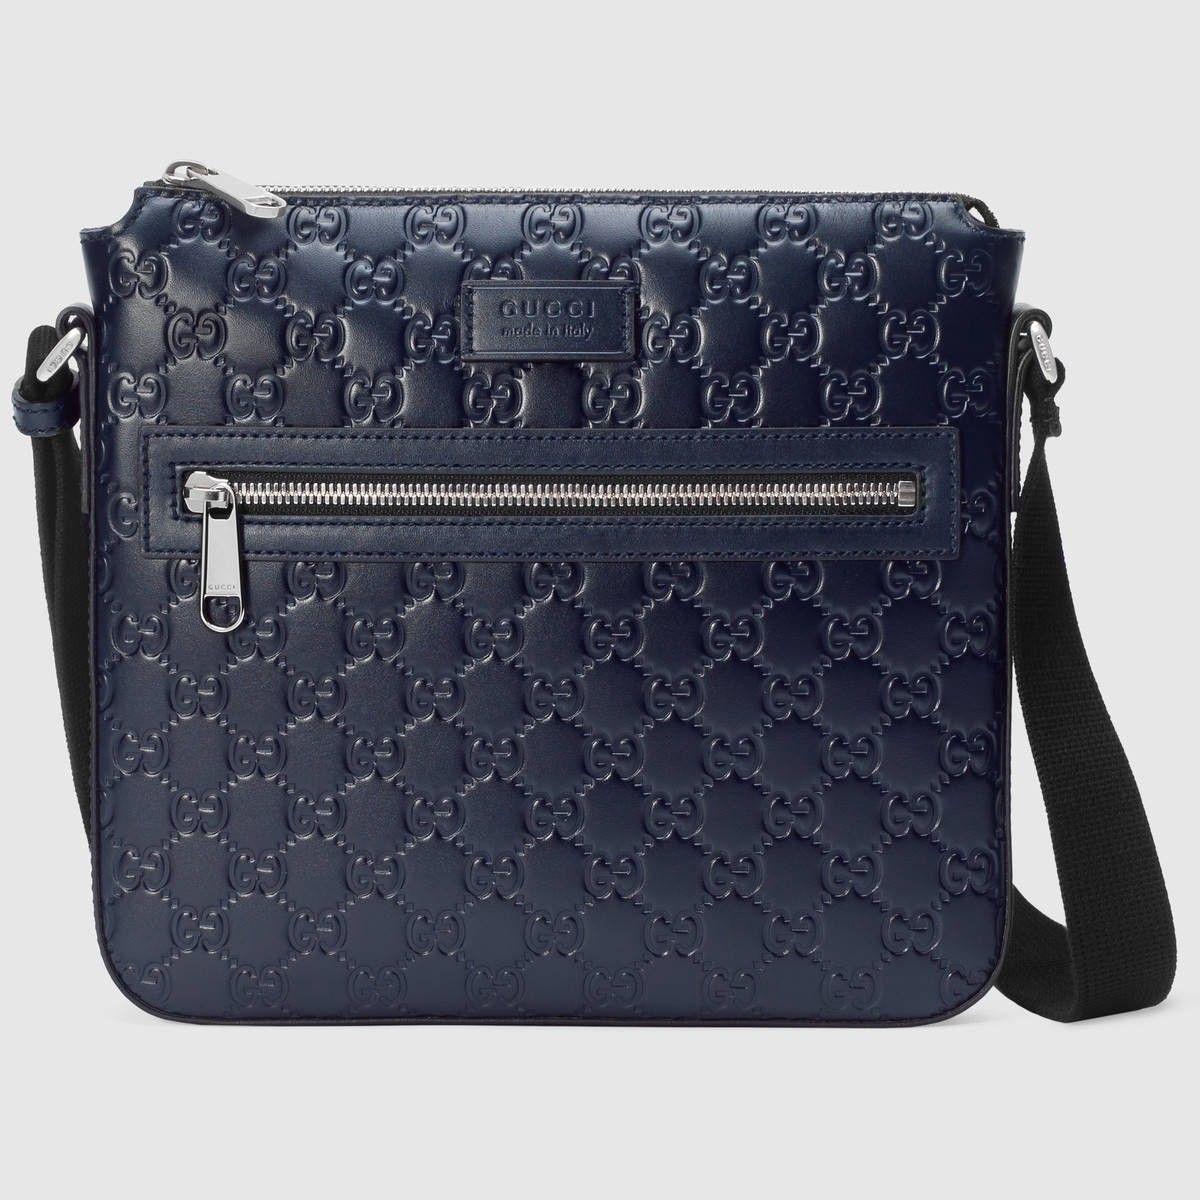 a1406f5ce GUCCI Gucci Signature messenger - blue Gucci Signature. #gucci #bags  #shoulder bags #lining #nylon #suede #